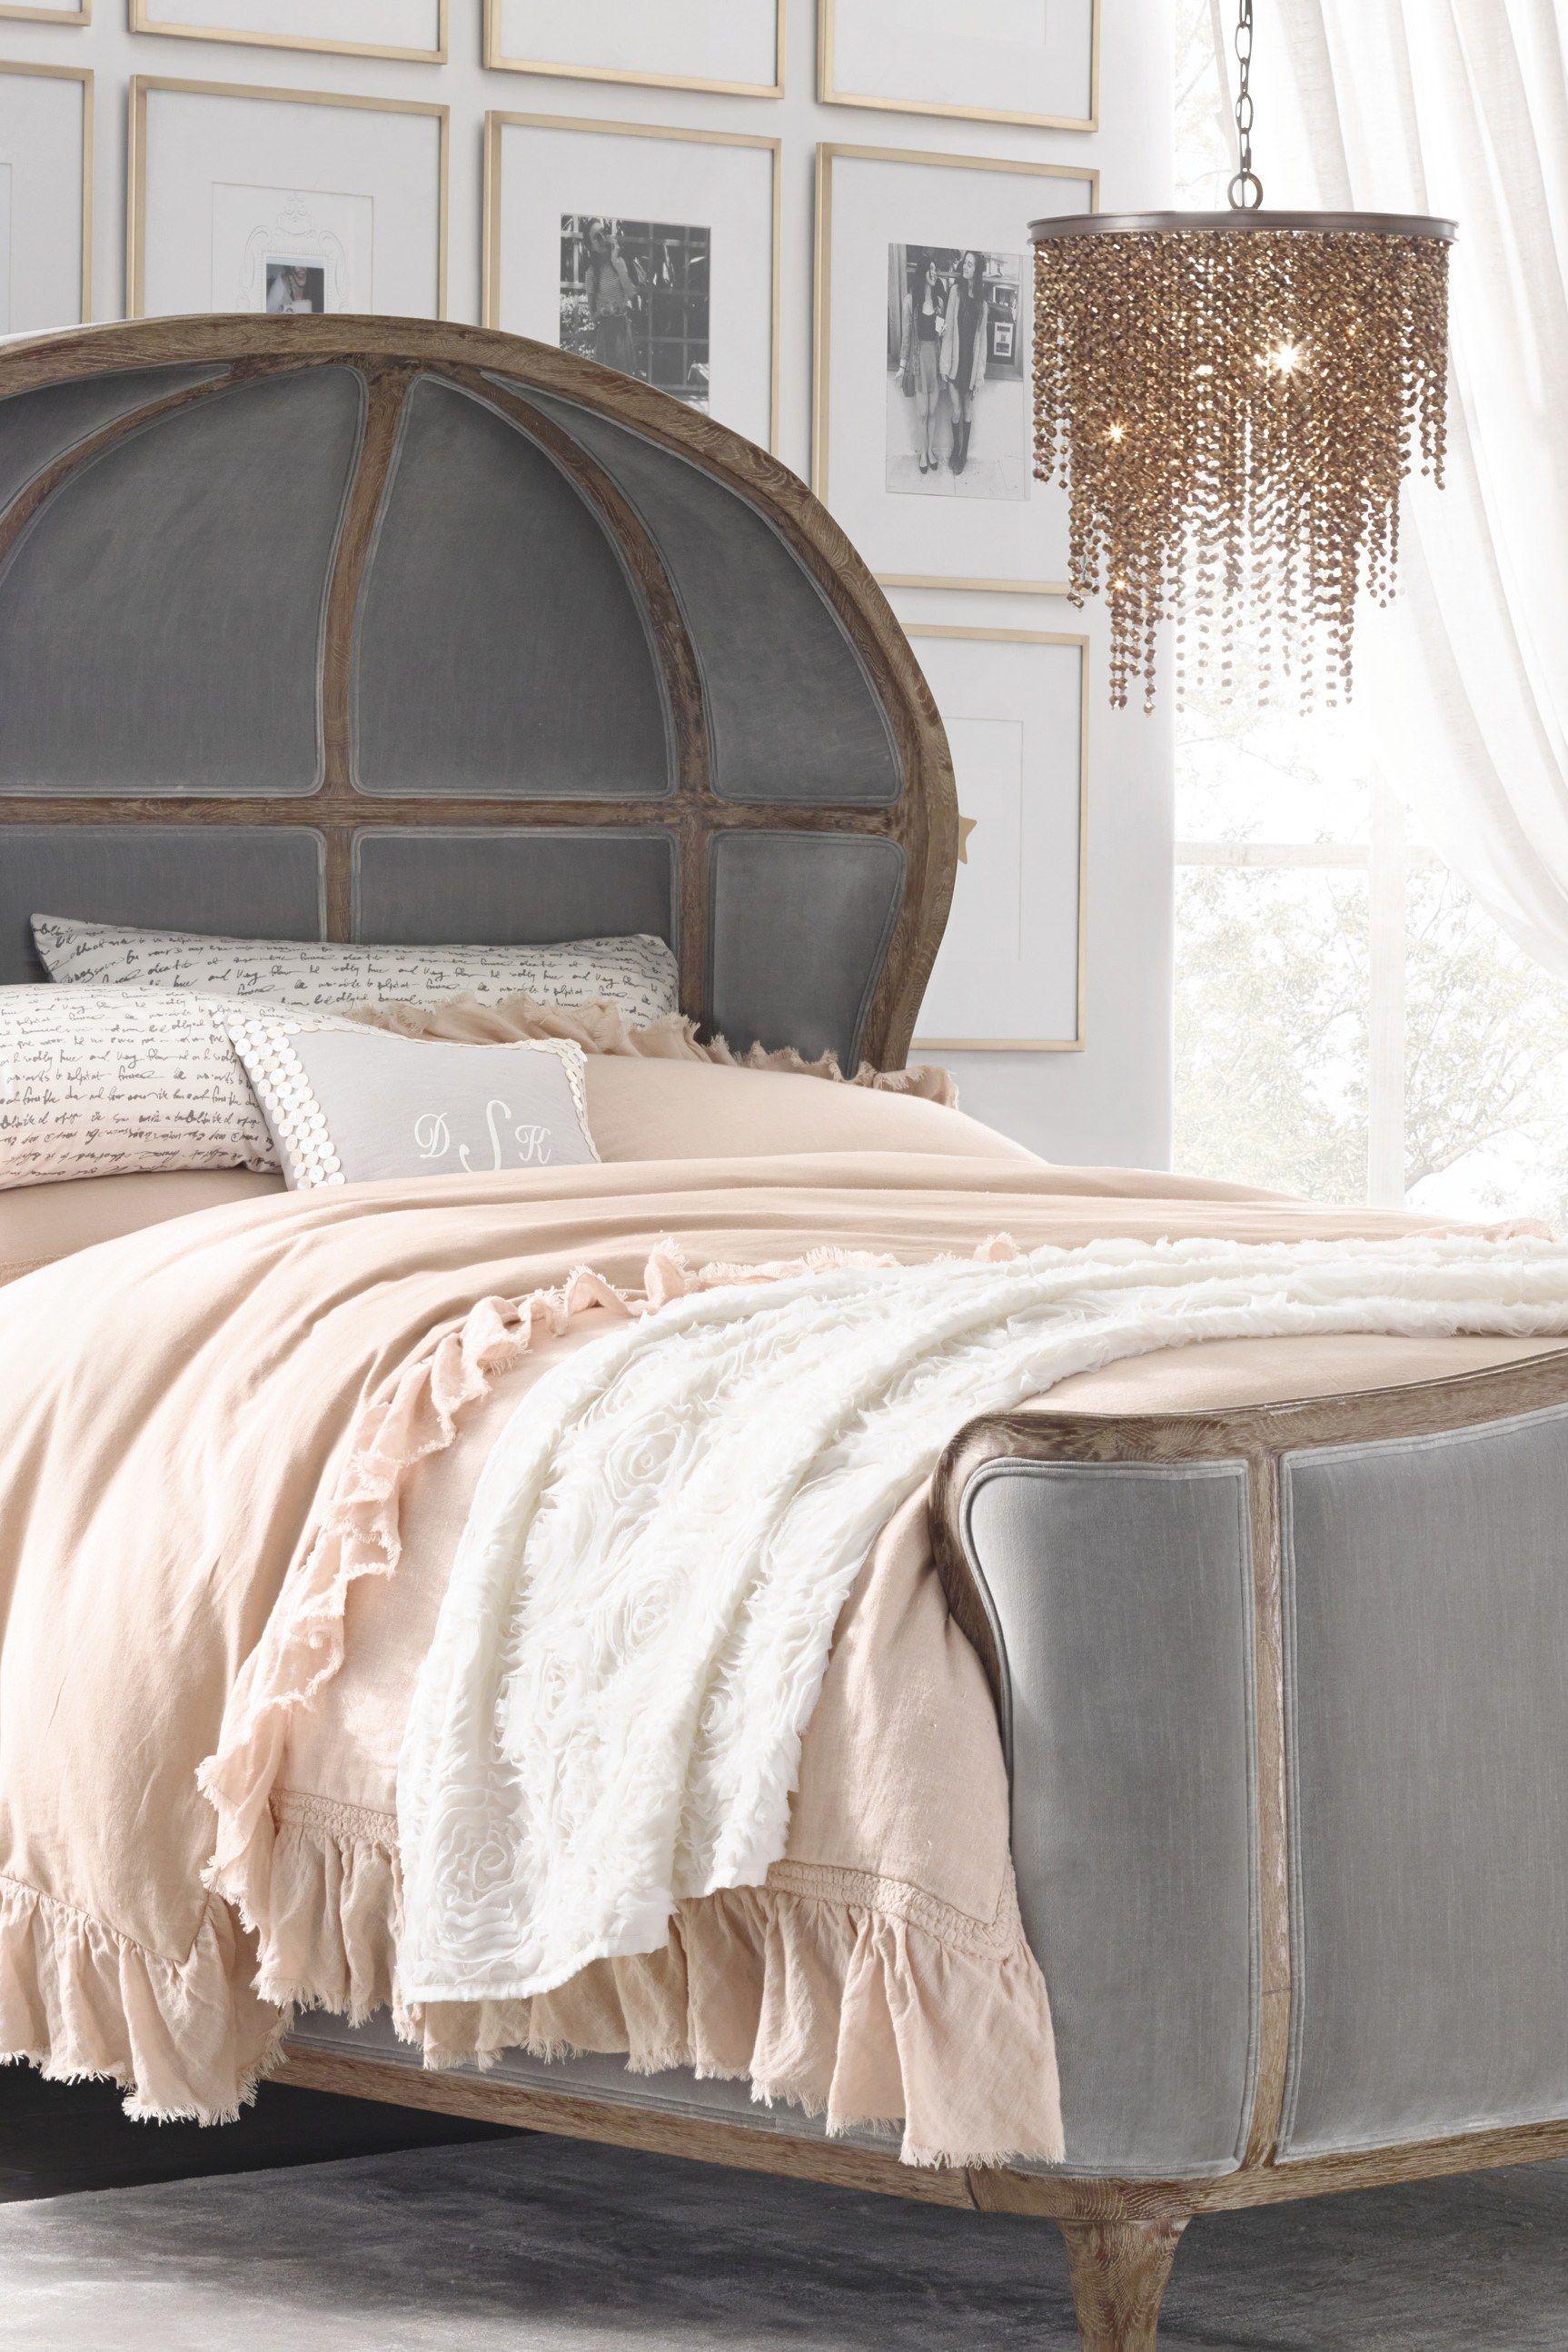 Dream Bedroom Alert Restoration Hardware S New Line Is Finally Here